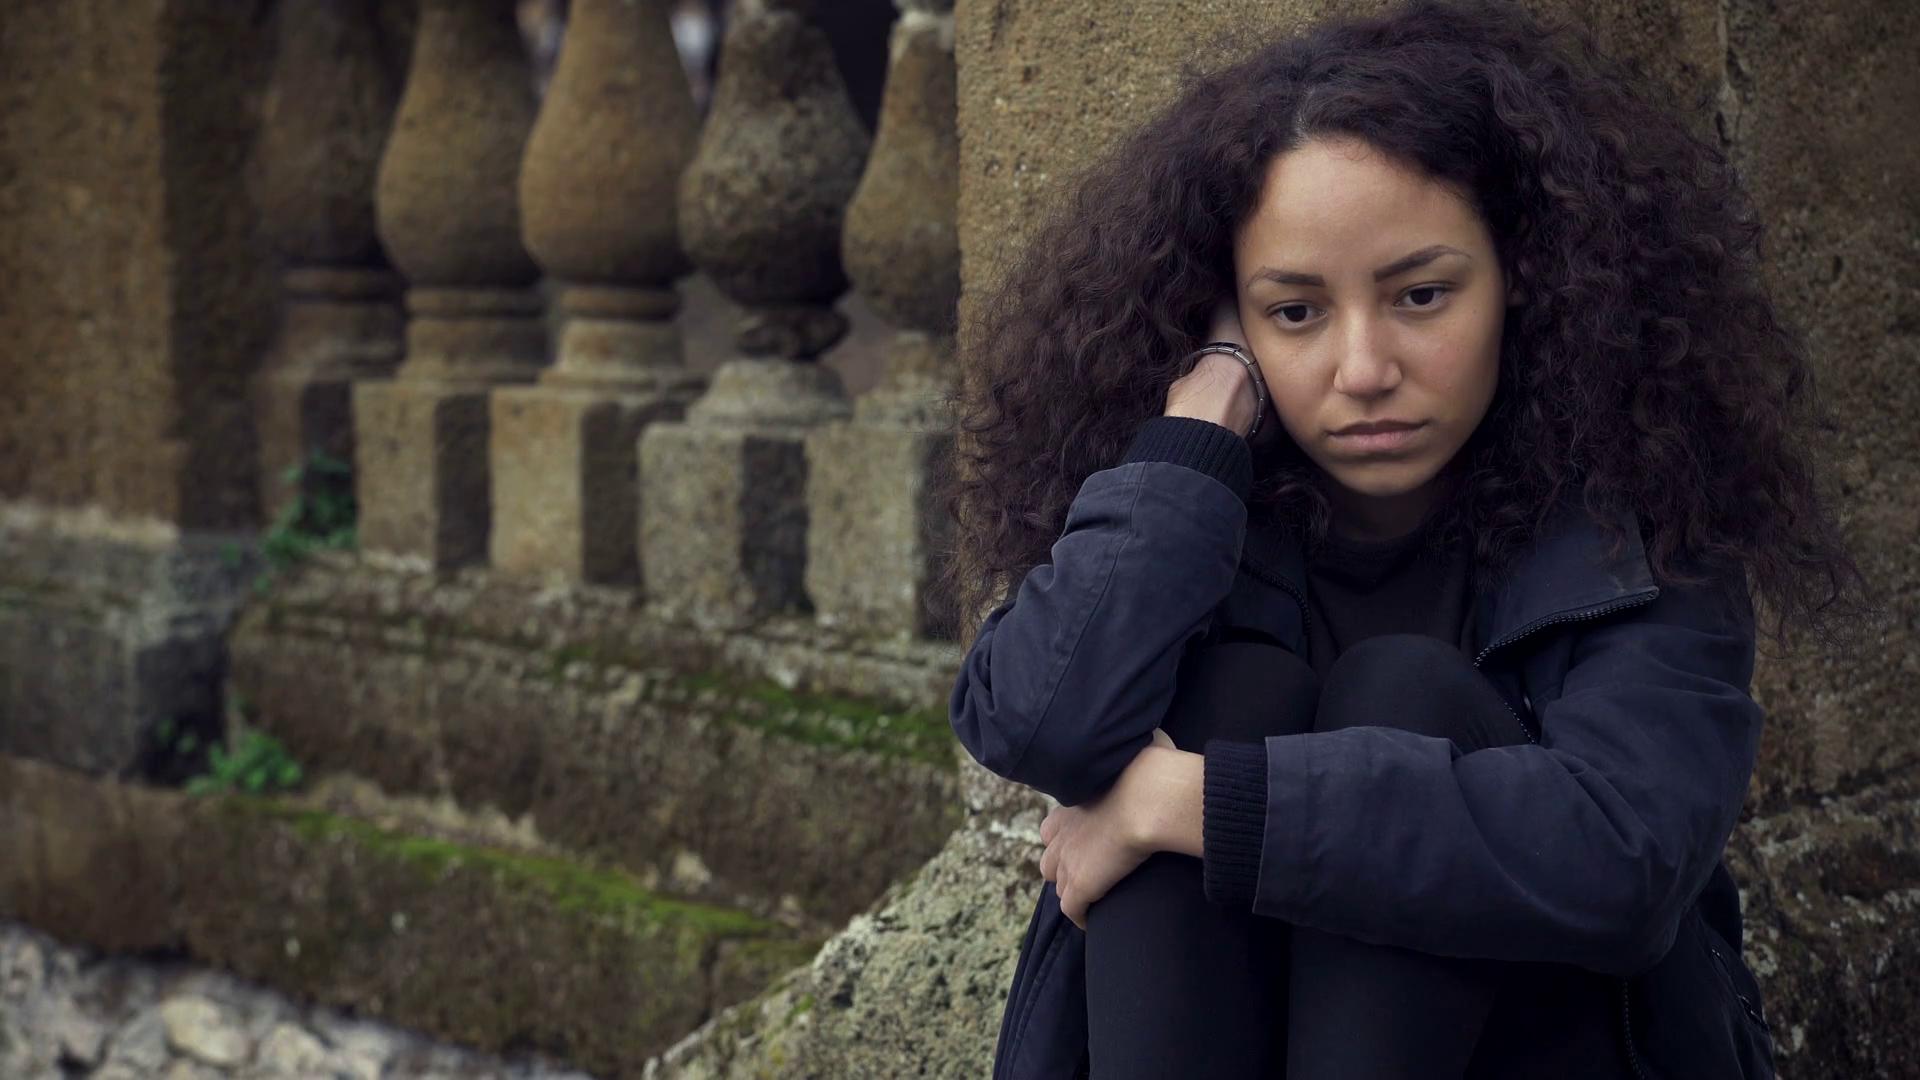 sad depressed woman sitting a